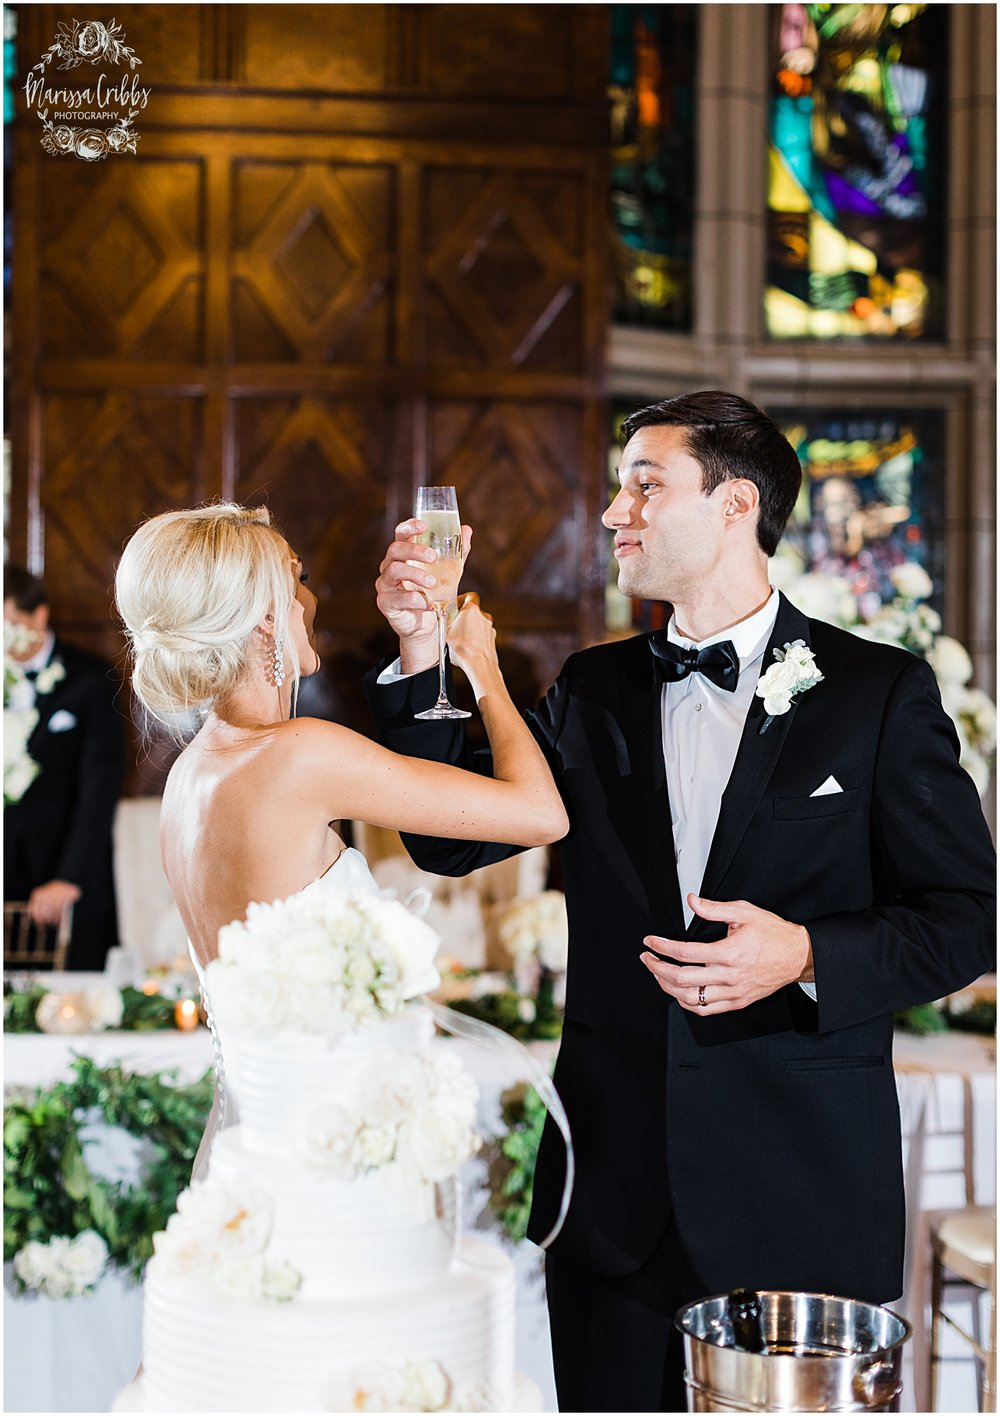 NOLL WEDDING | THE BRASS ON BALTIMORE | MARISSA CRIBBS PHOTOGRAPHY_6361.jpg